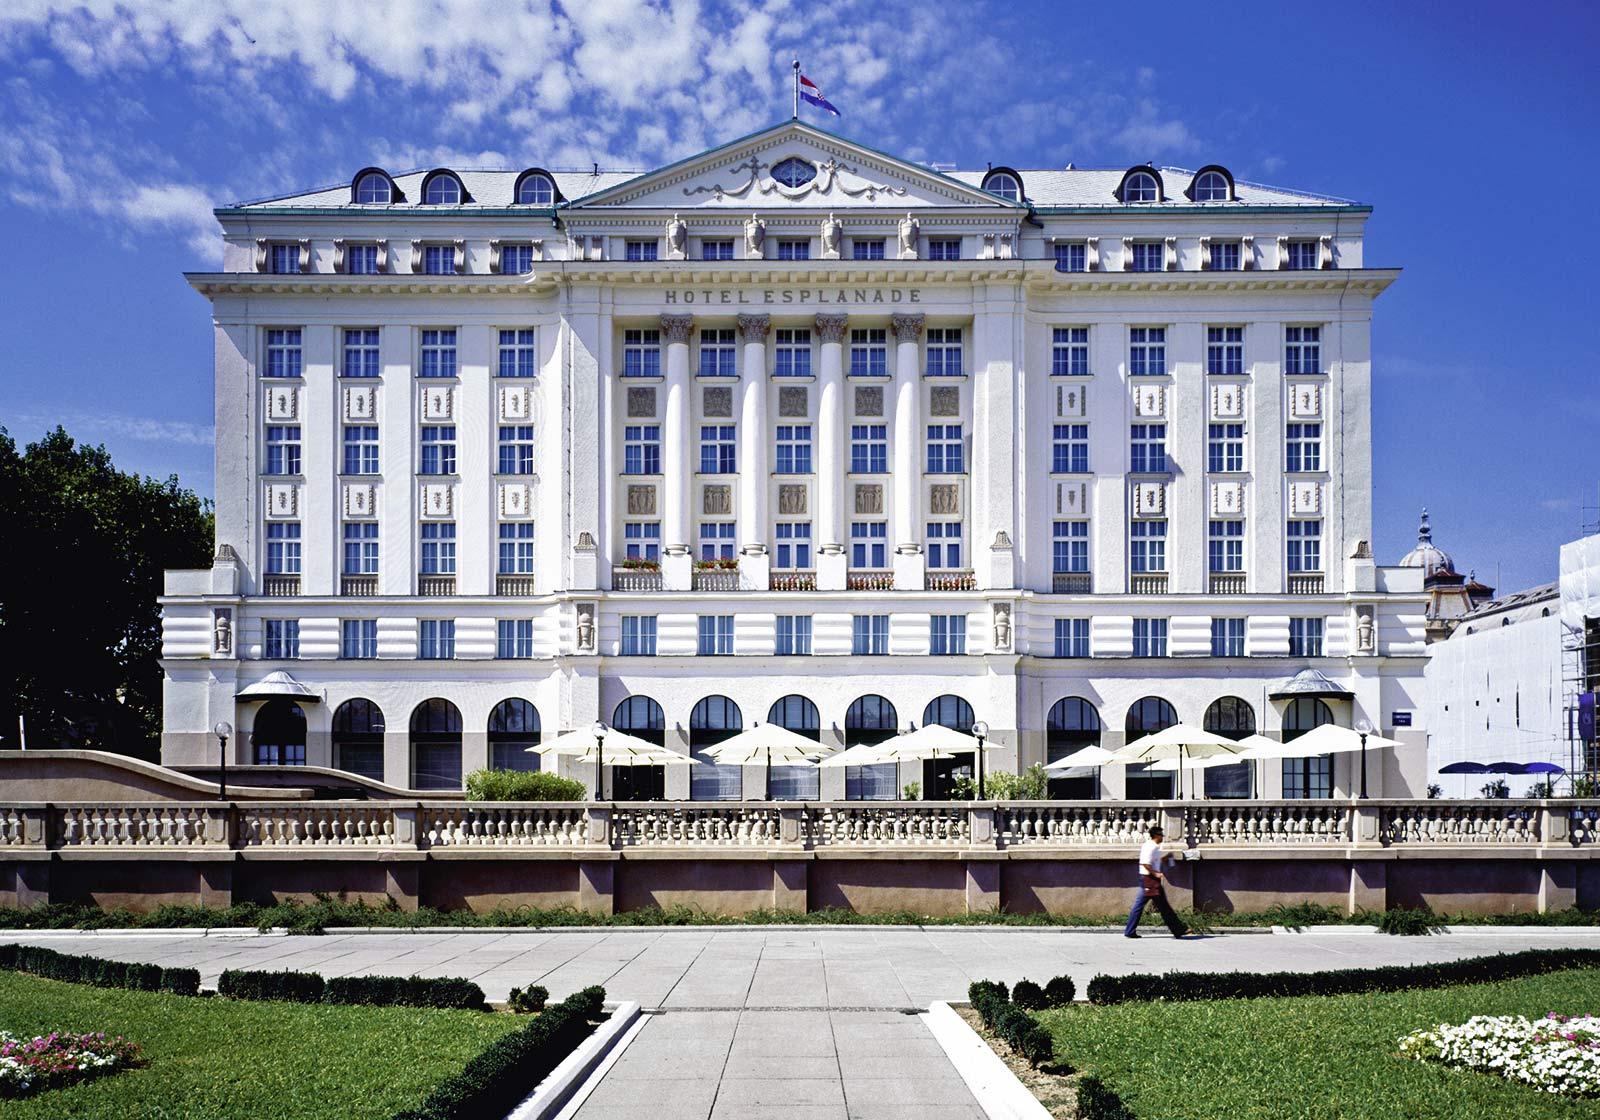 http://citypal.me/wp-content/uploads/2015/11/ESPLANADE-ZAGREB-HOTEL-7.jpg